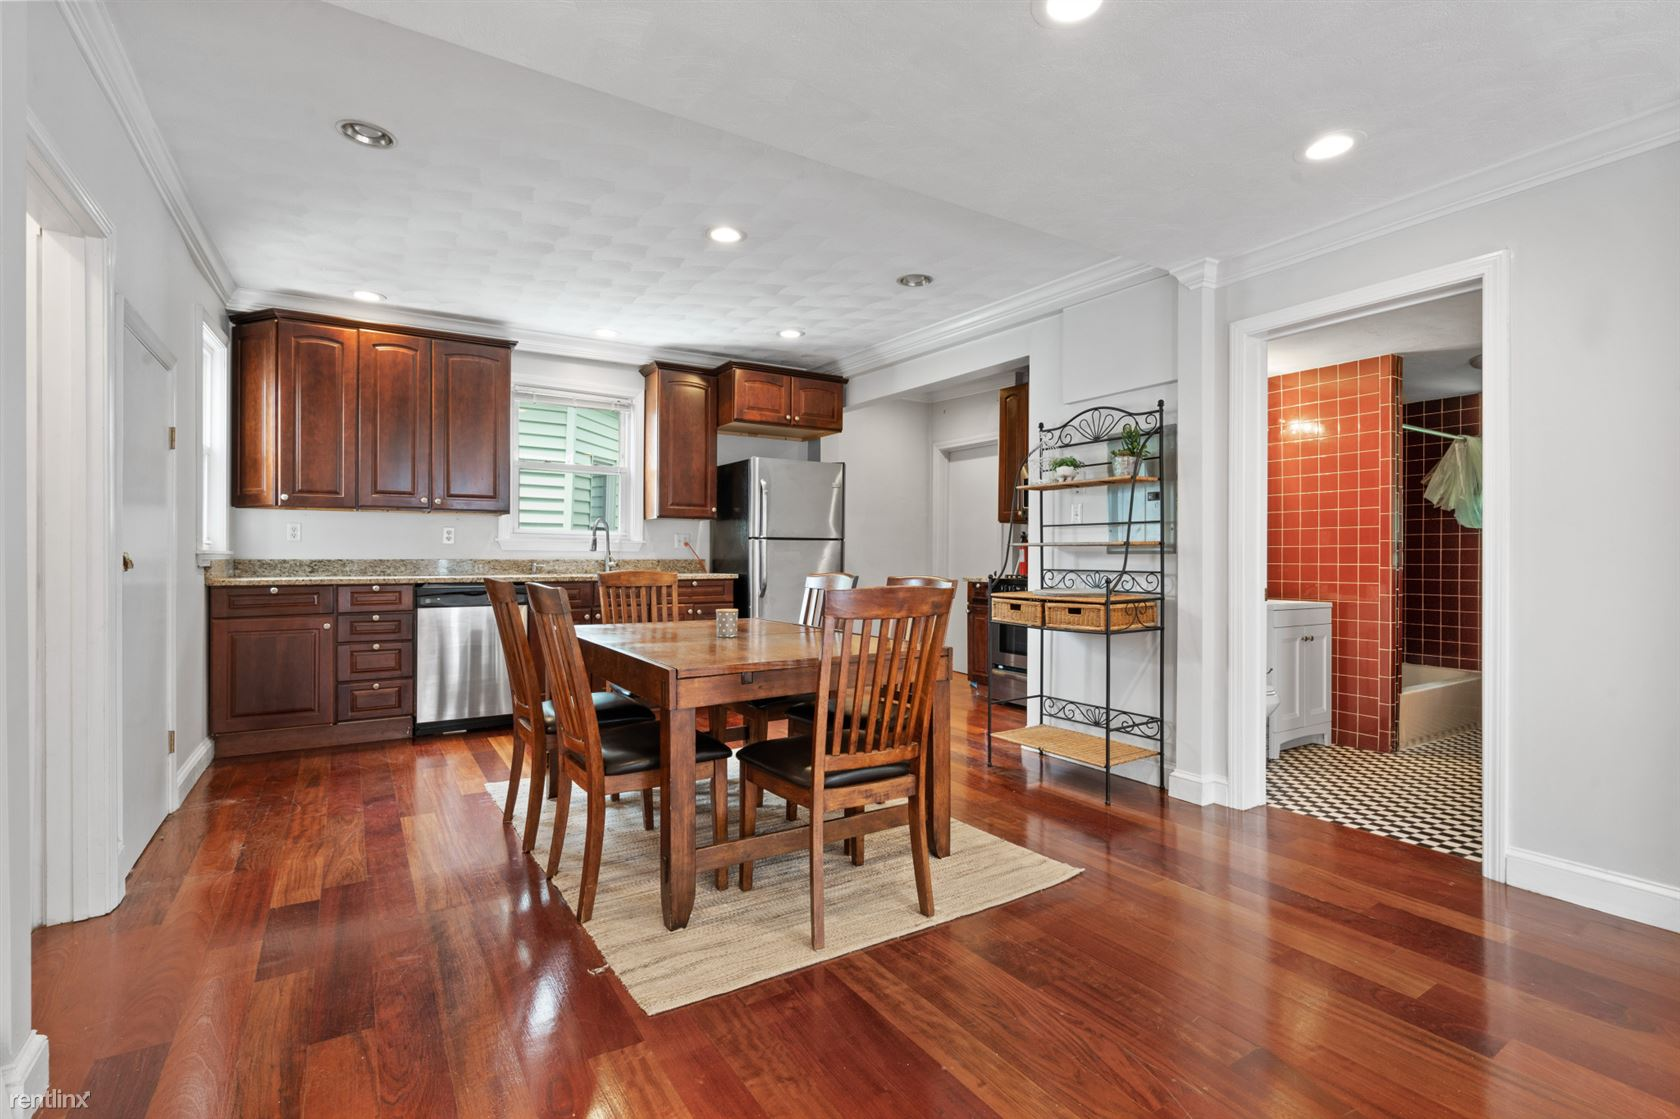 7 Blackwell St, Dorchester, MA - $3,350